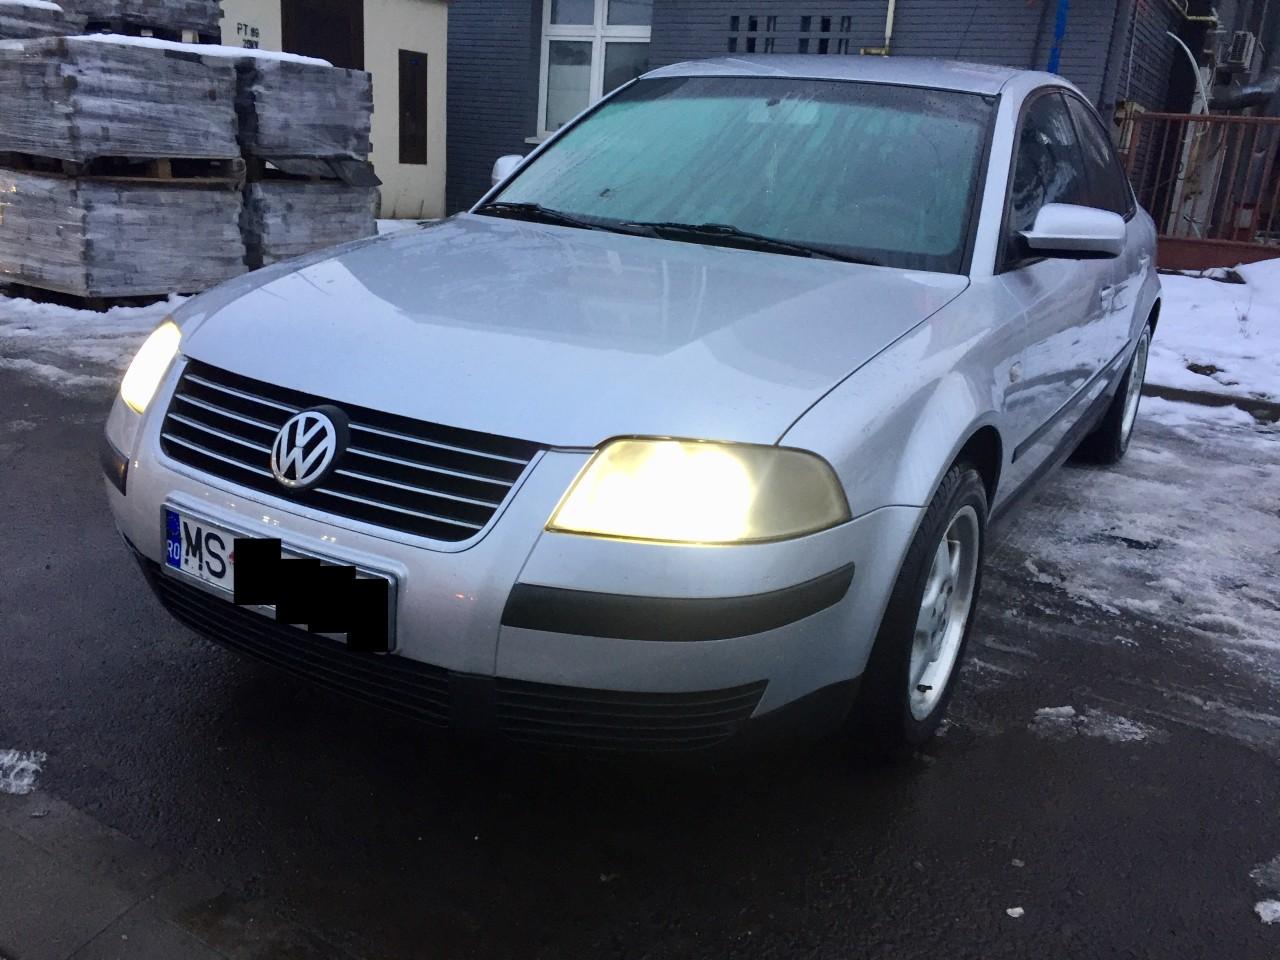 VW Passat 1.9 2001